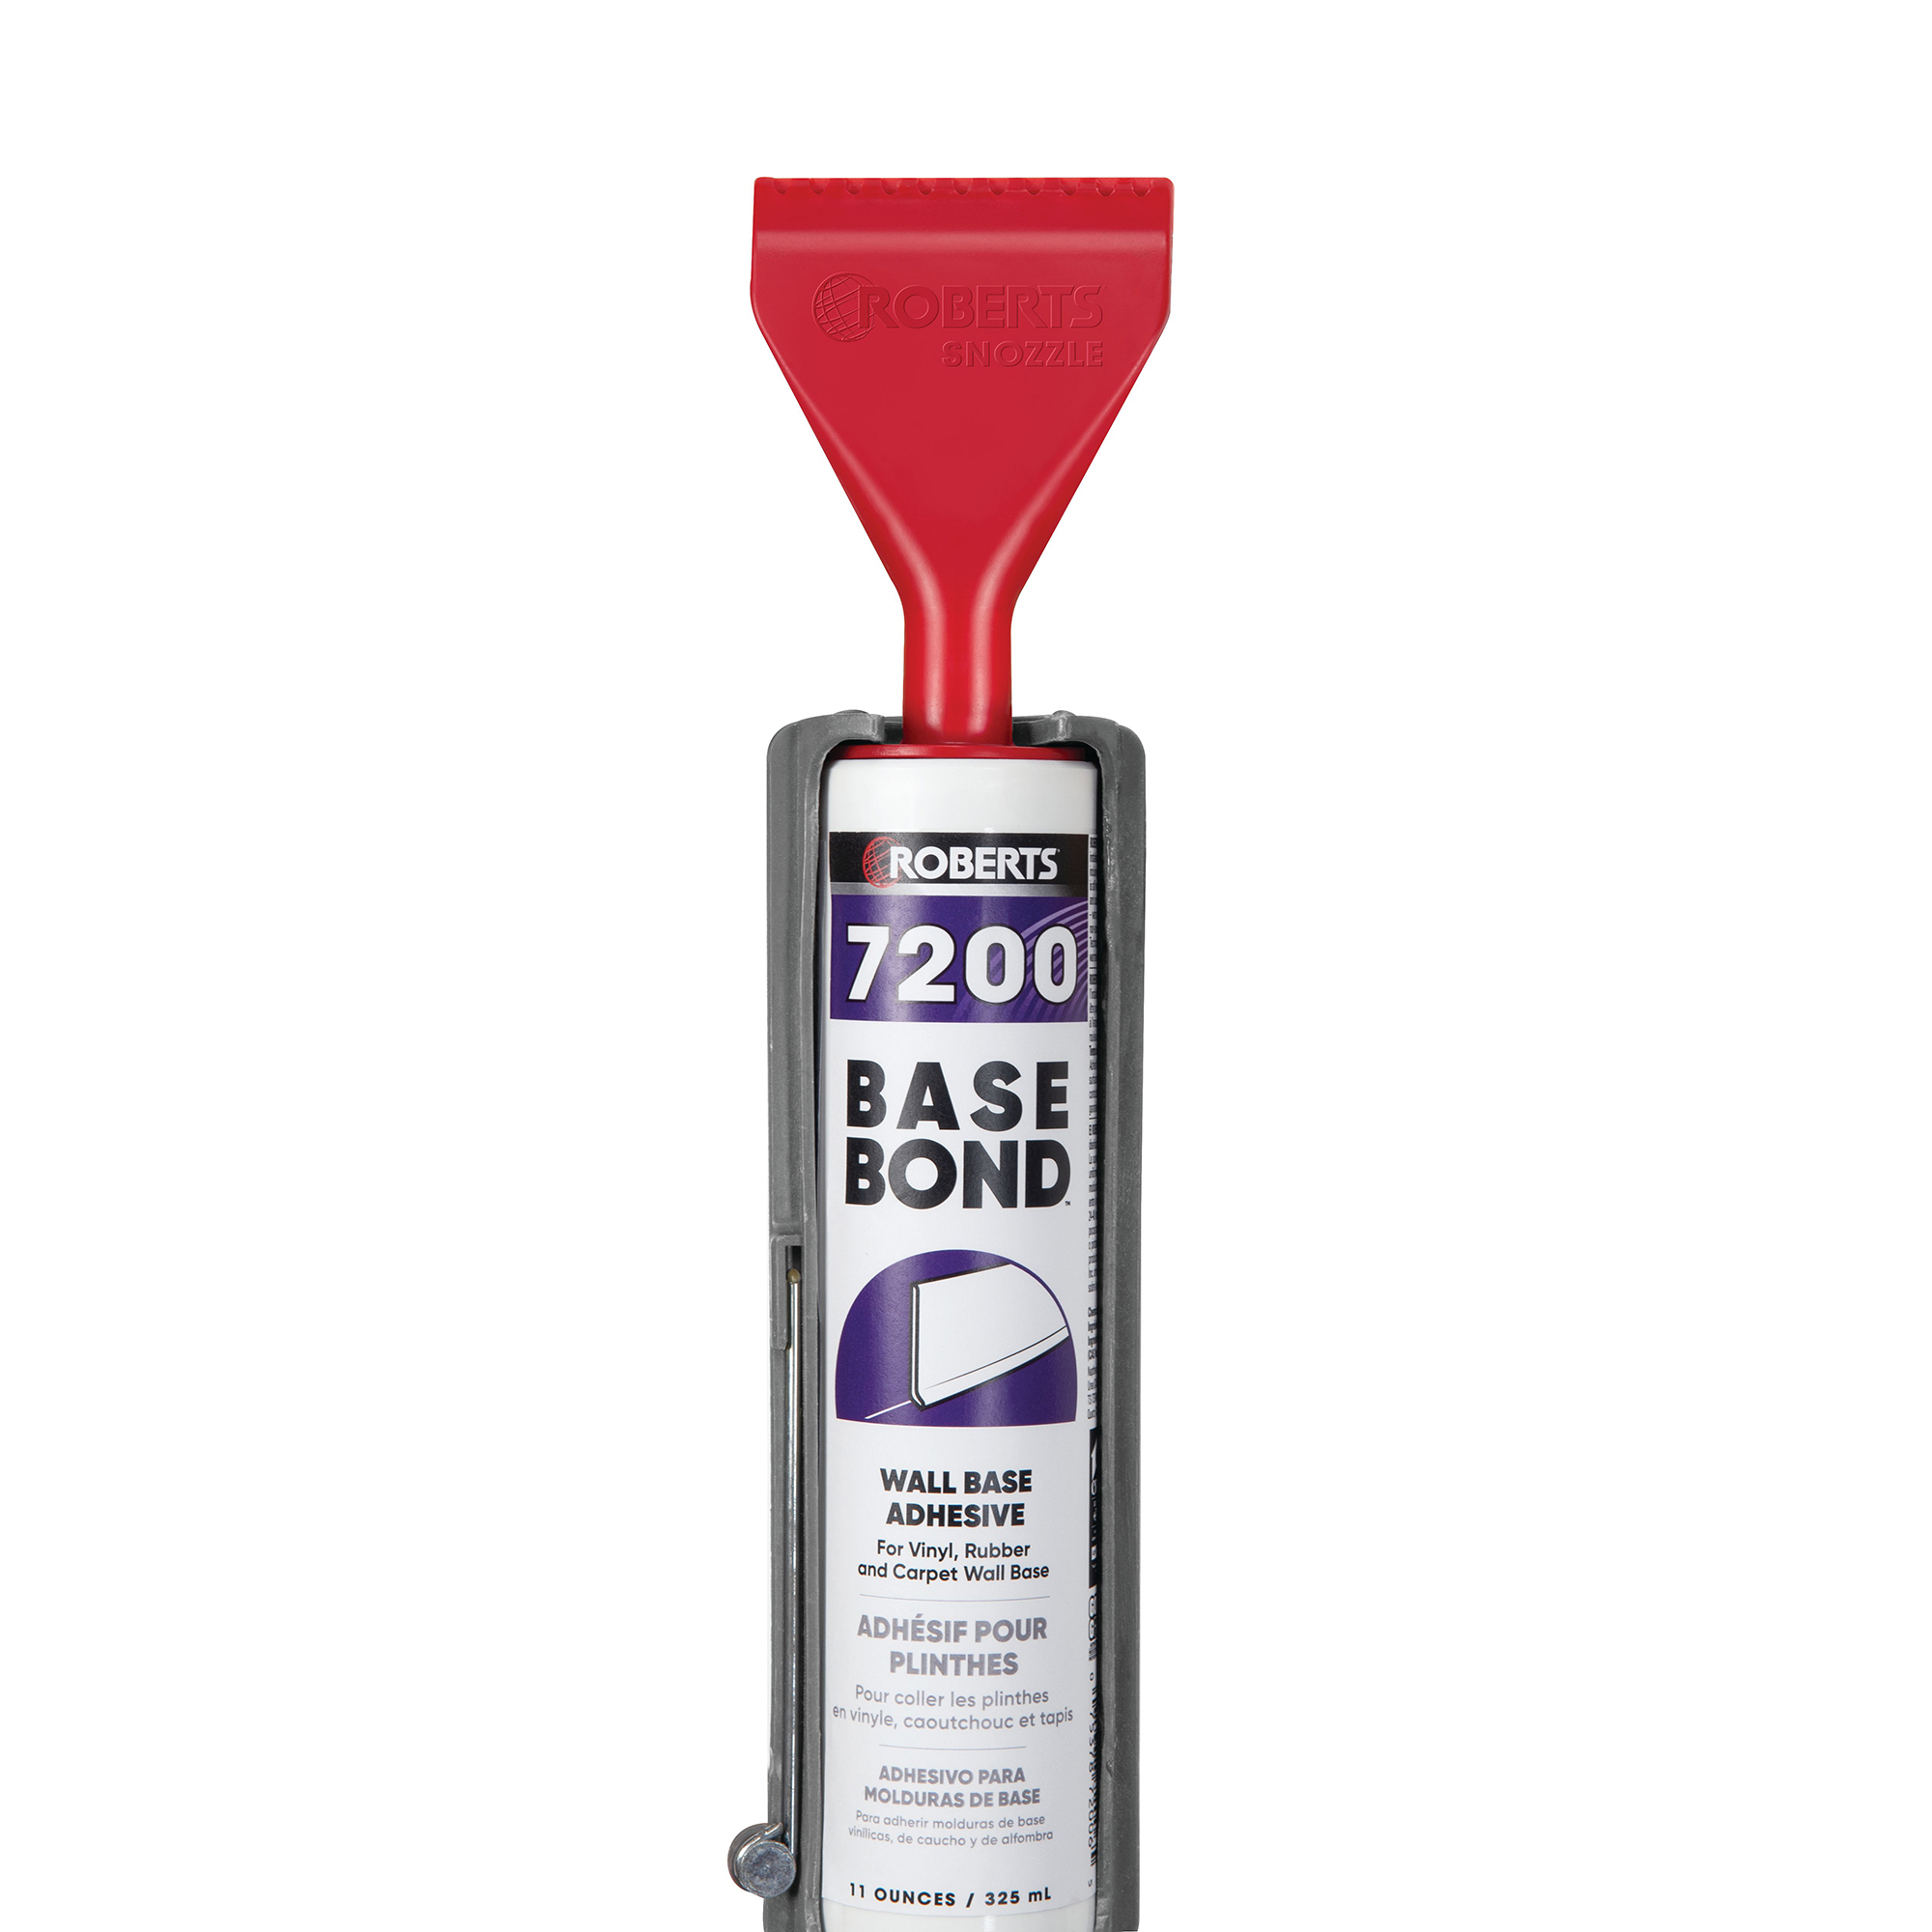 SNOZZLE Adhesive Applicator